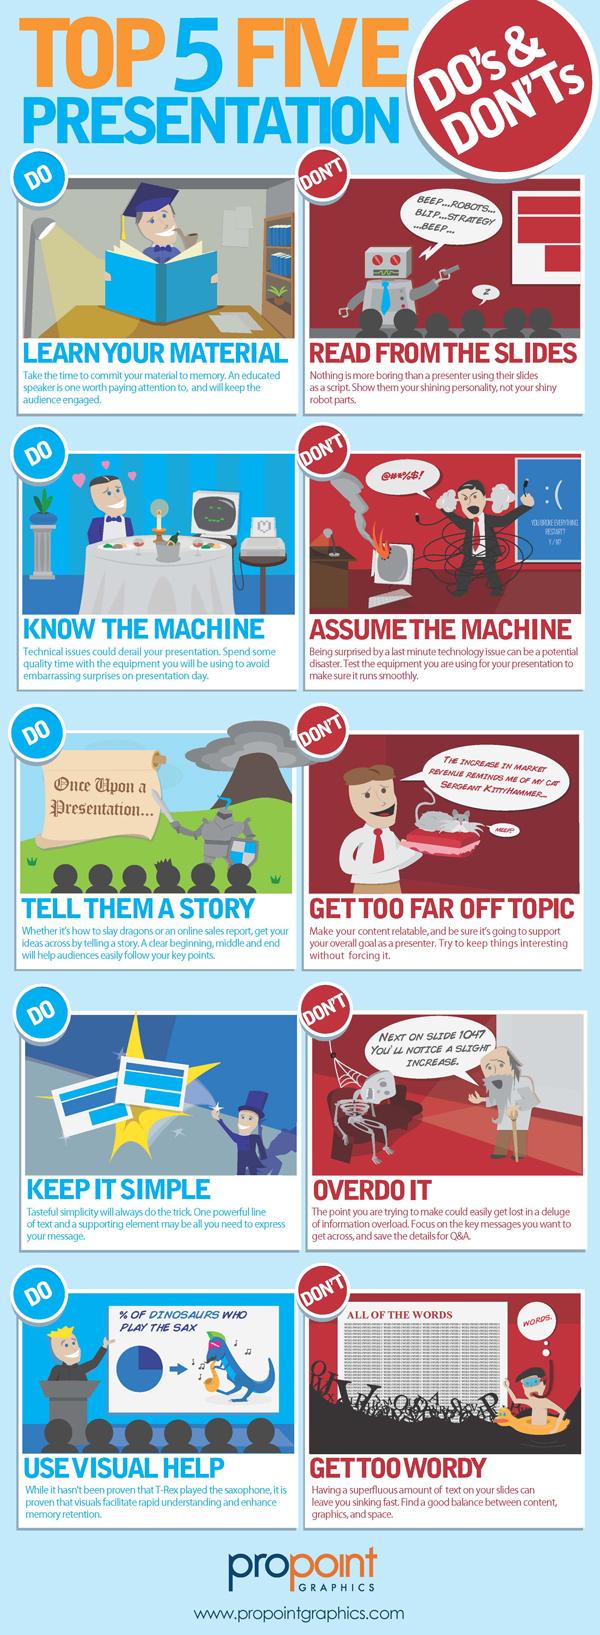 Top Five Presentation Do's & Don'ts